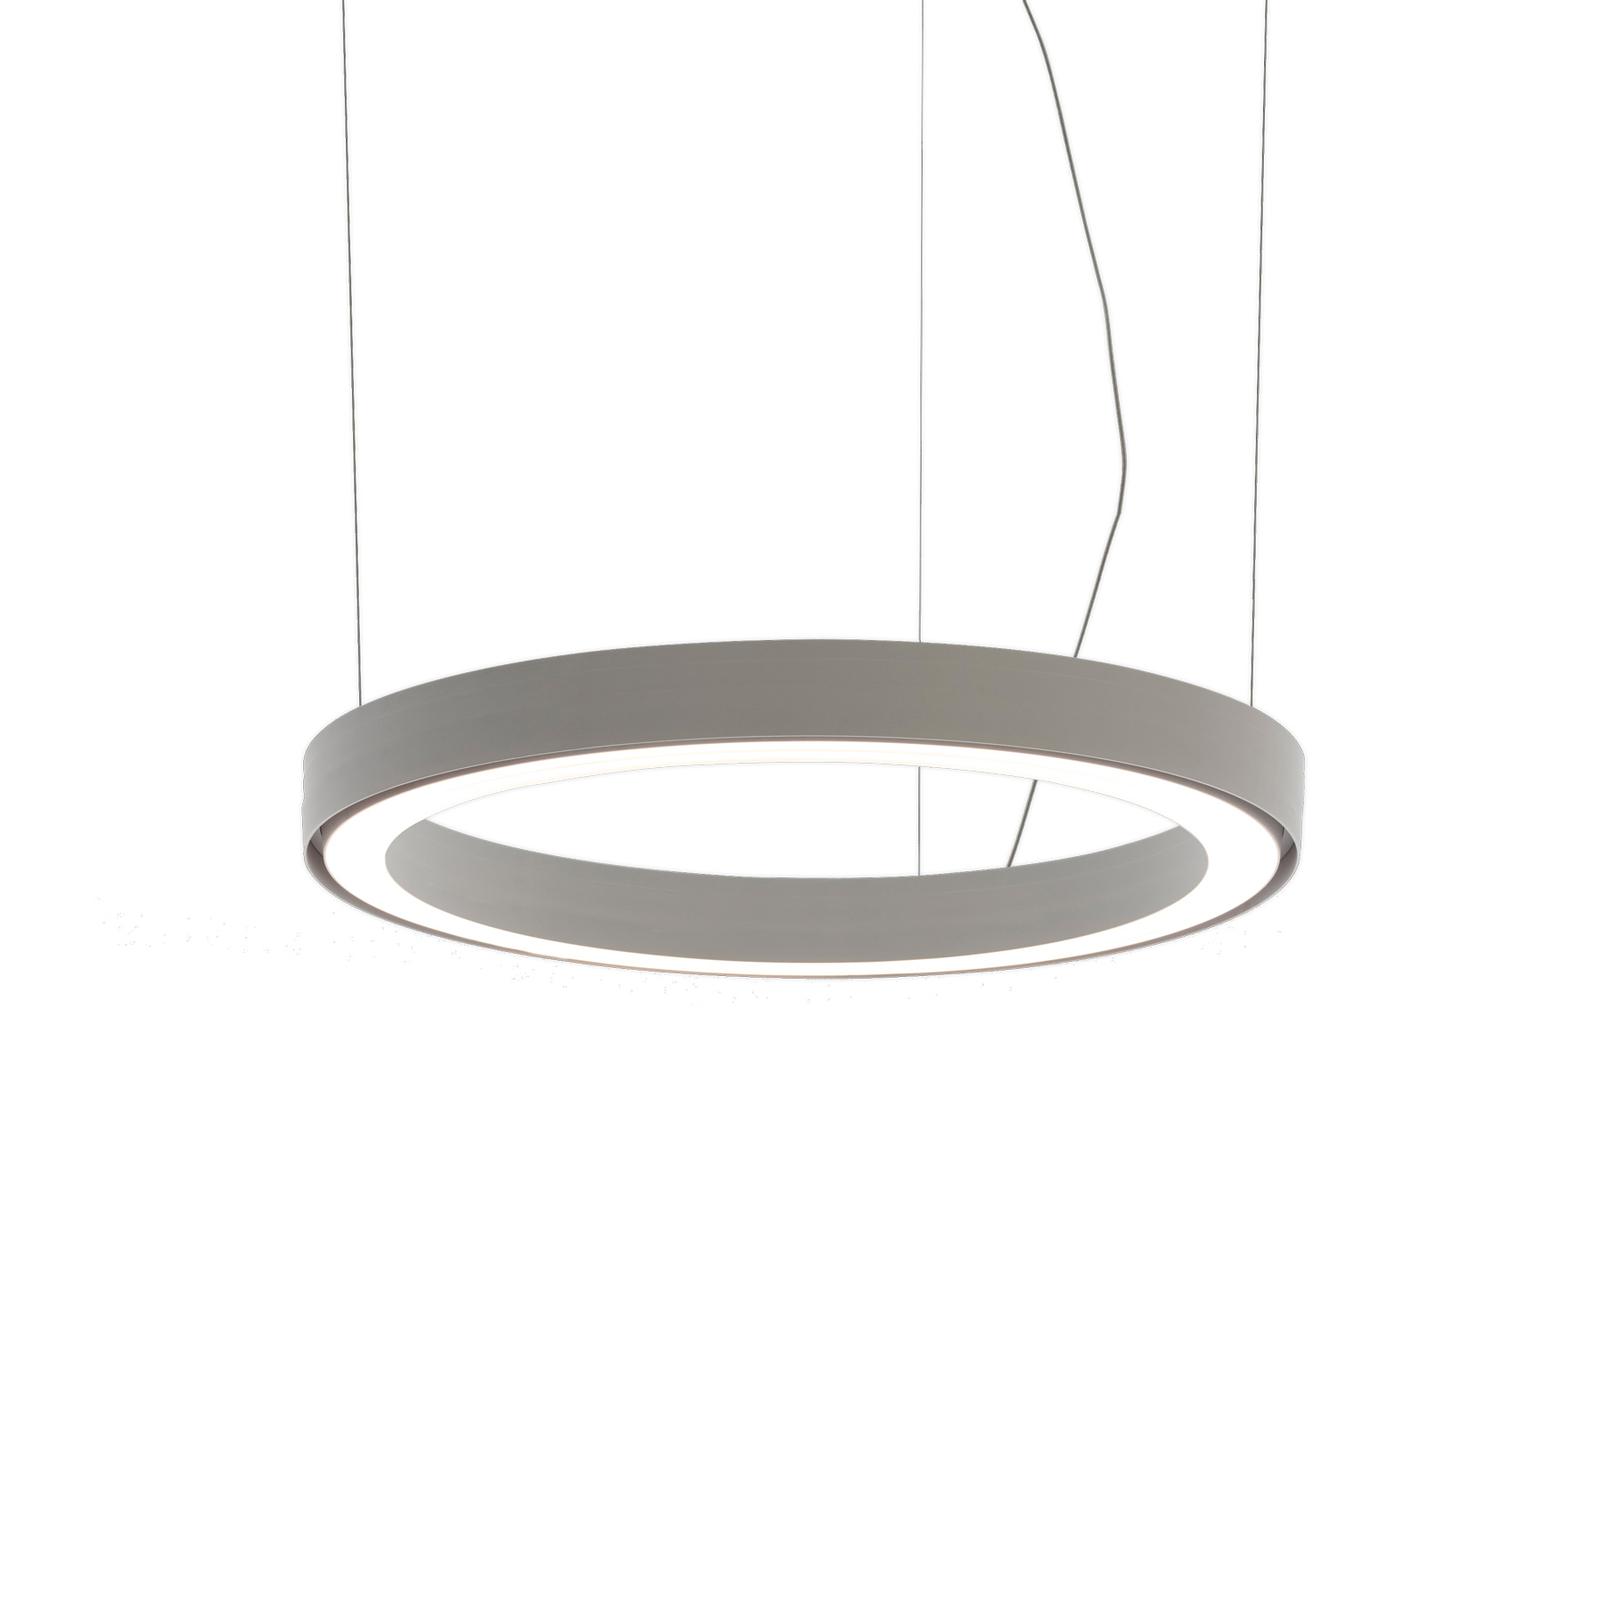 Artemide Ripple-LED-riippuvalo, sovellus, Ø 50 cm